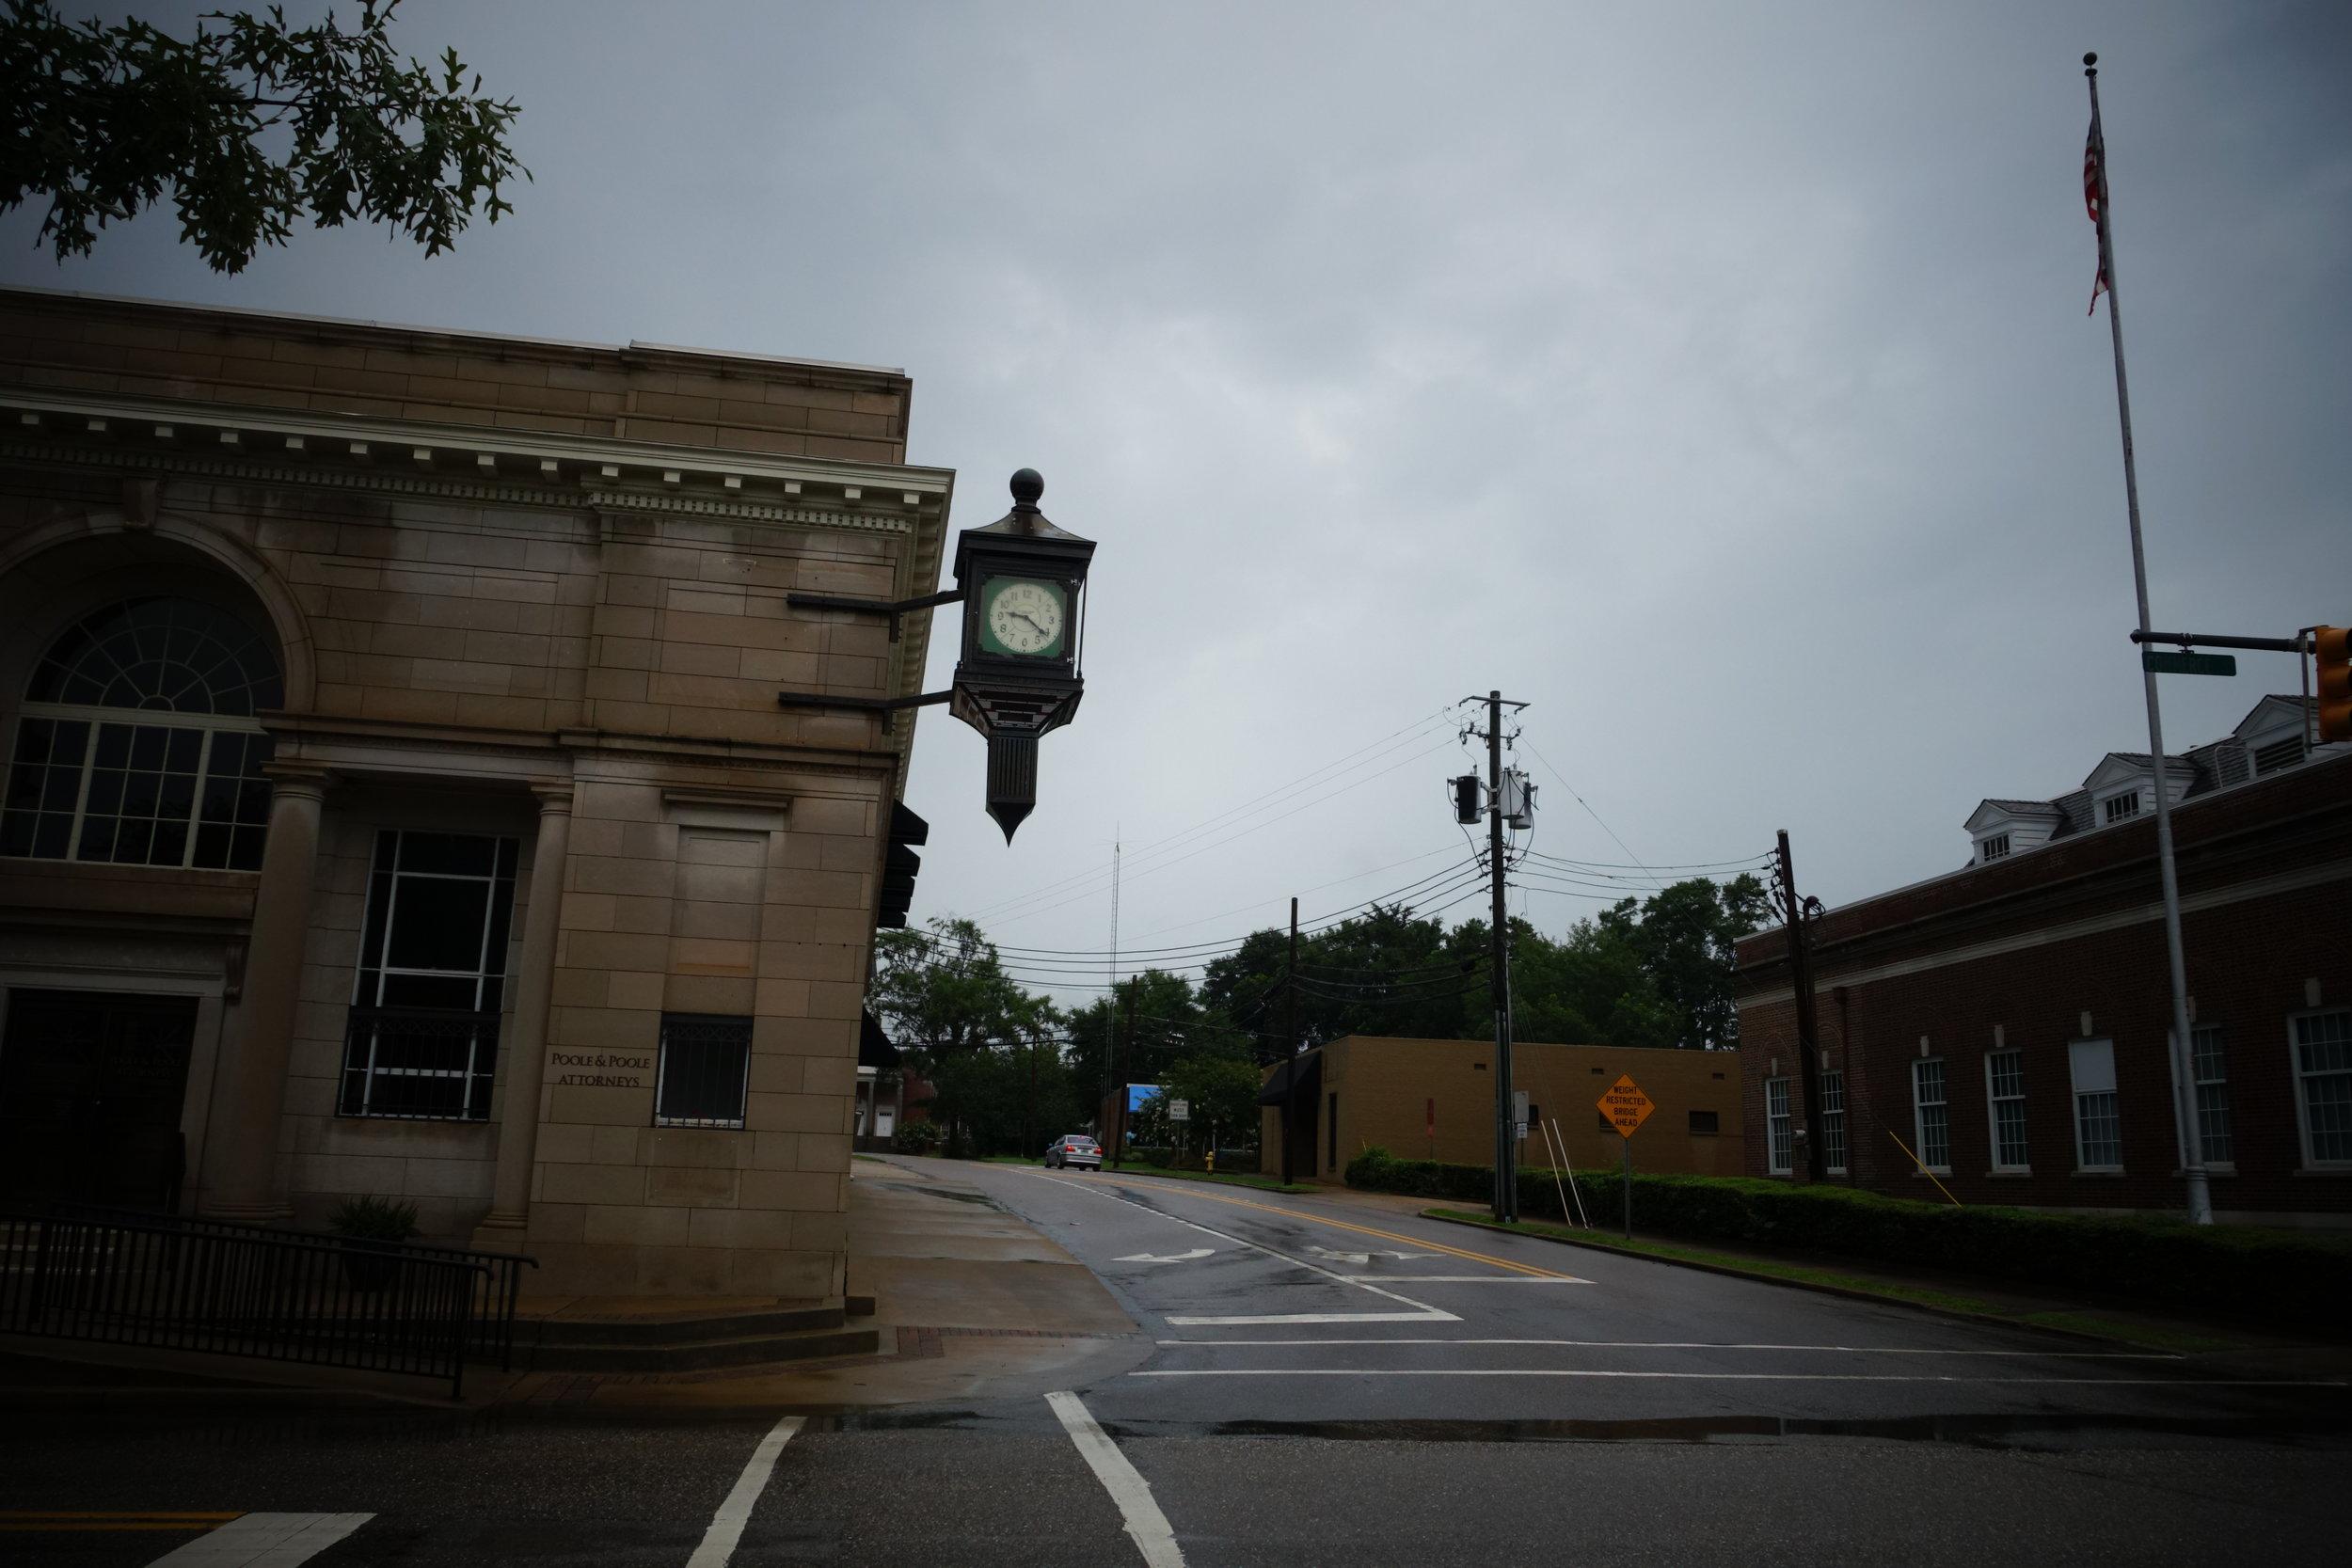 Downtown Greenville, AL